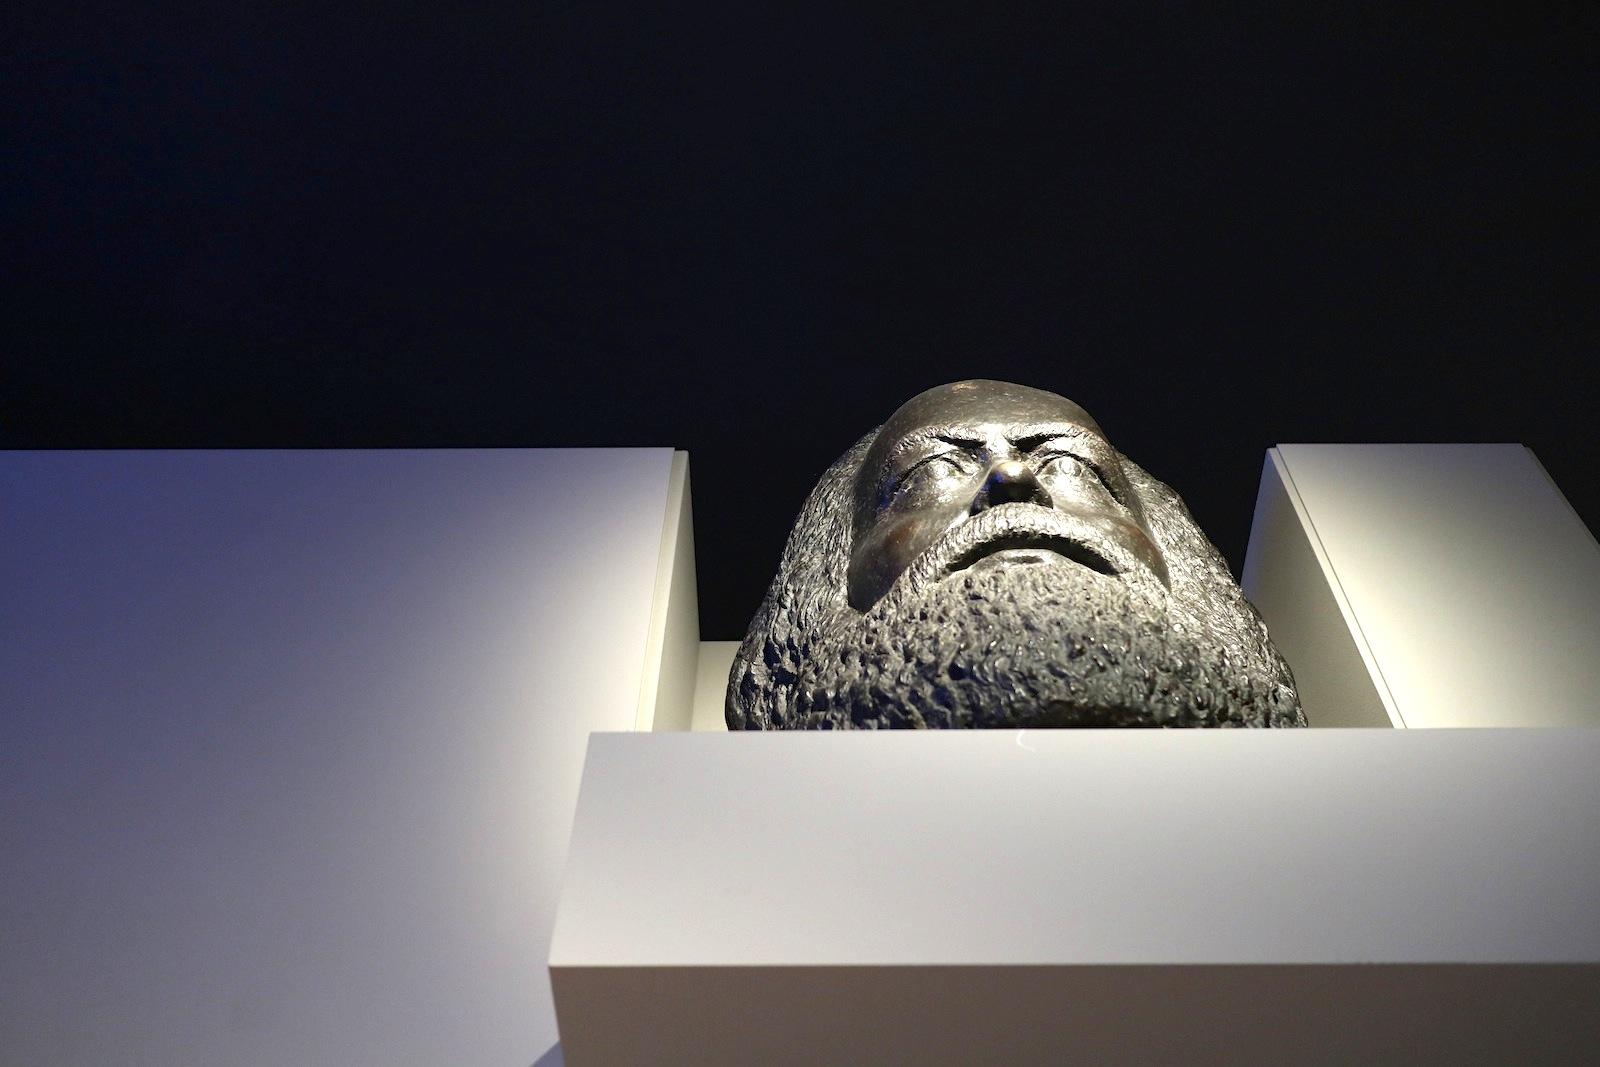 Museum in der Kulturbrauerei. Karl Marx-Büste